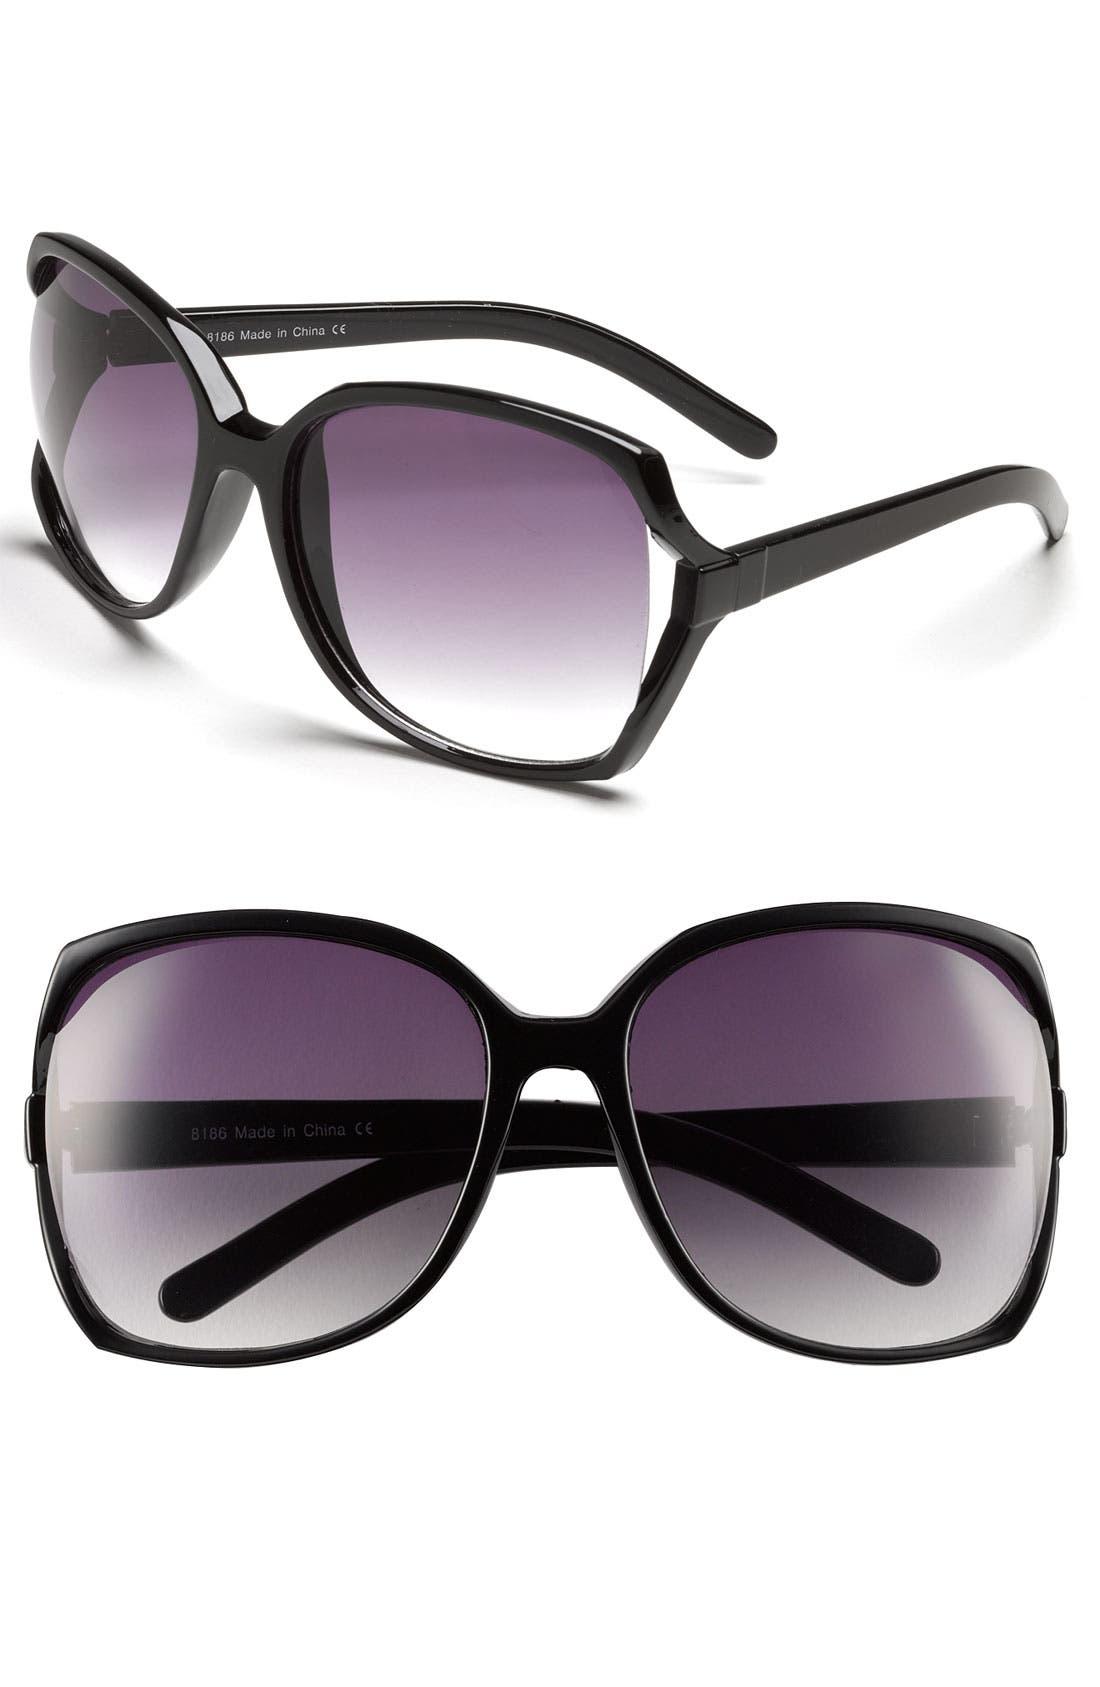 Alternate Image 1 Selected - KW 'Nicole' Oversized Frame Sunglasses (Juniors)